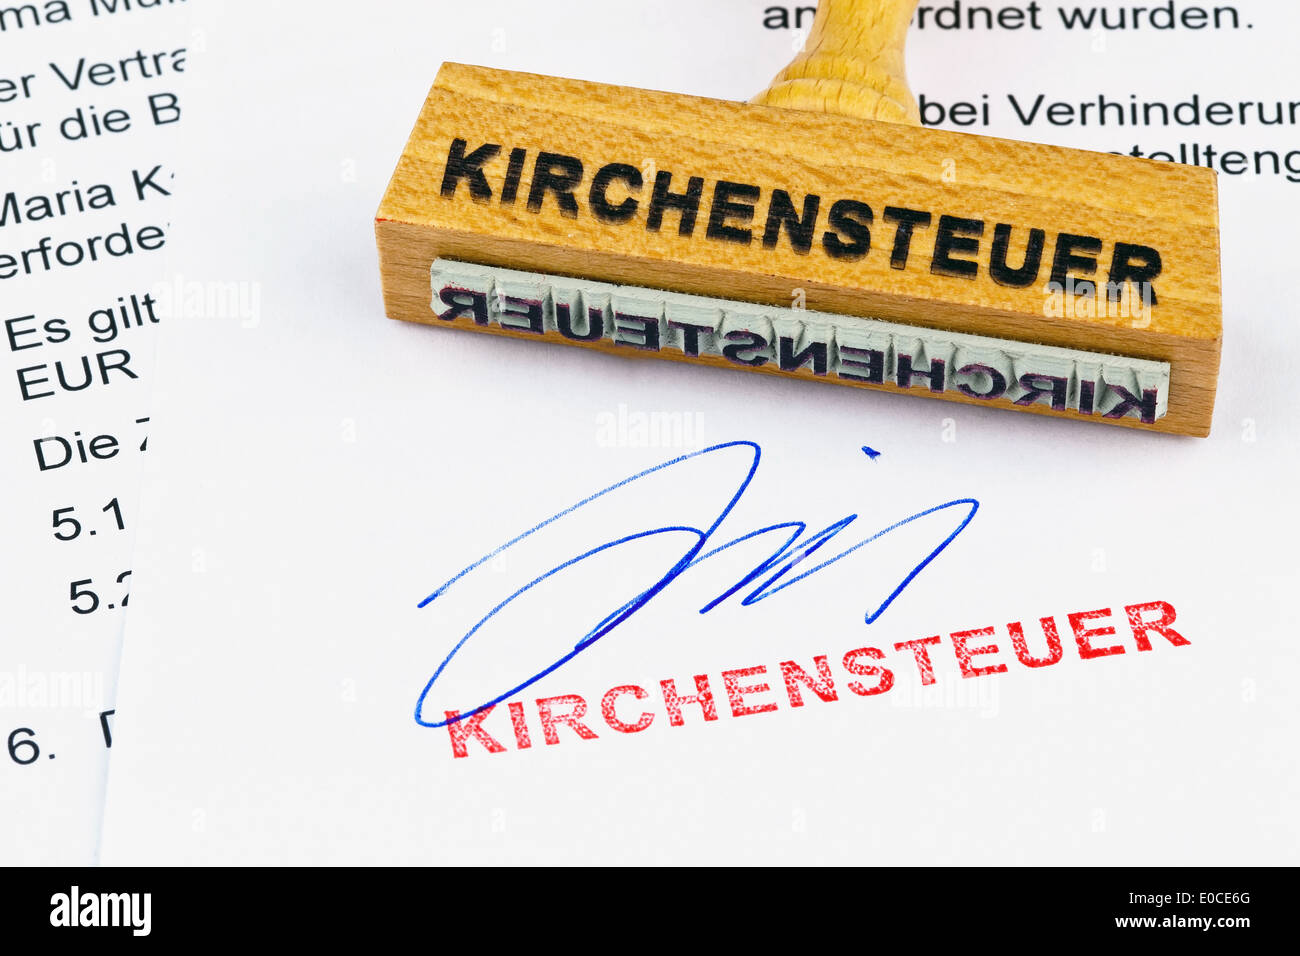 A stamp of wood lies on a document. Label Church-expensive, Ein Stempel aus Holz liegt auf einem Dokument. Aufschrift Stock Photo